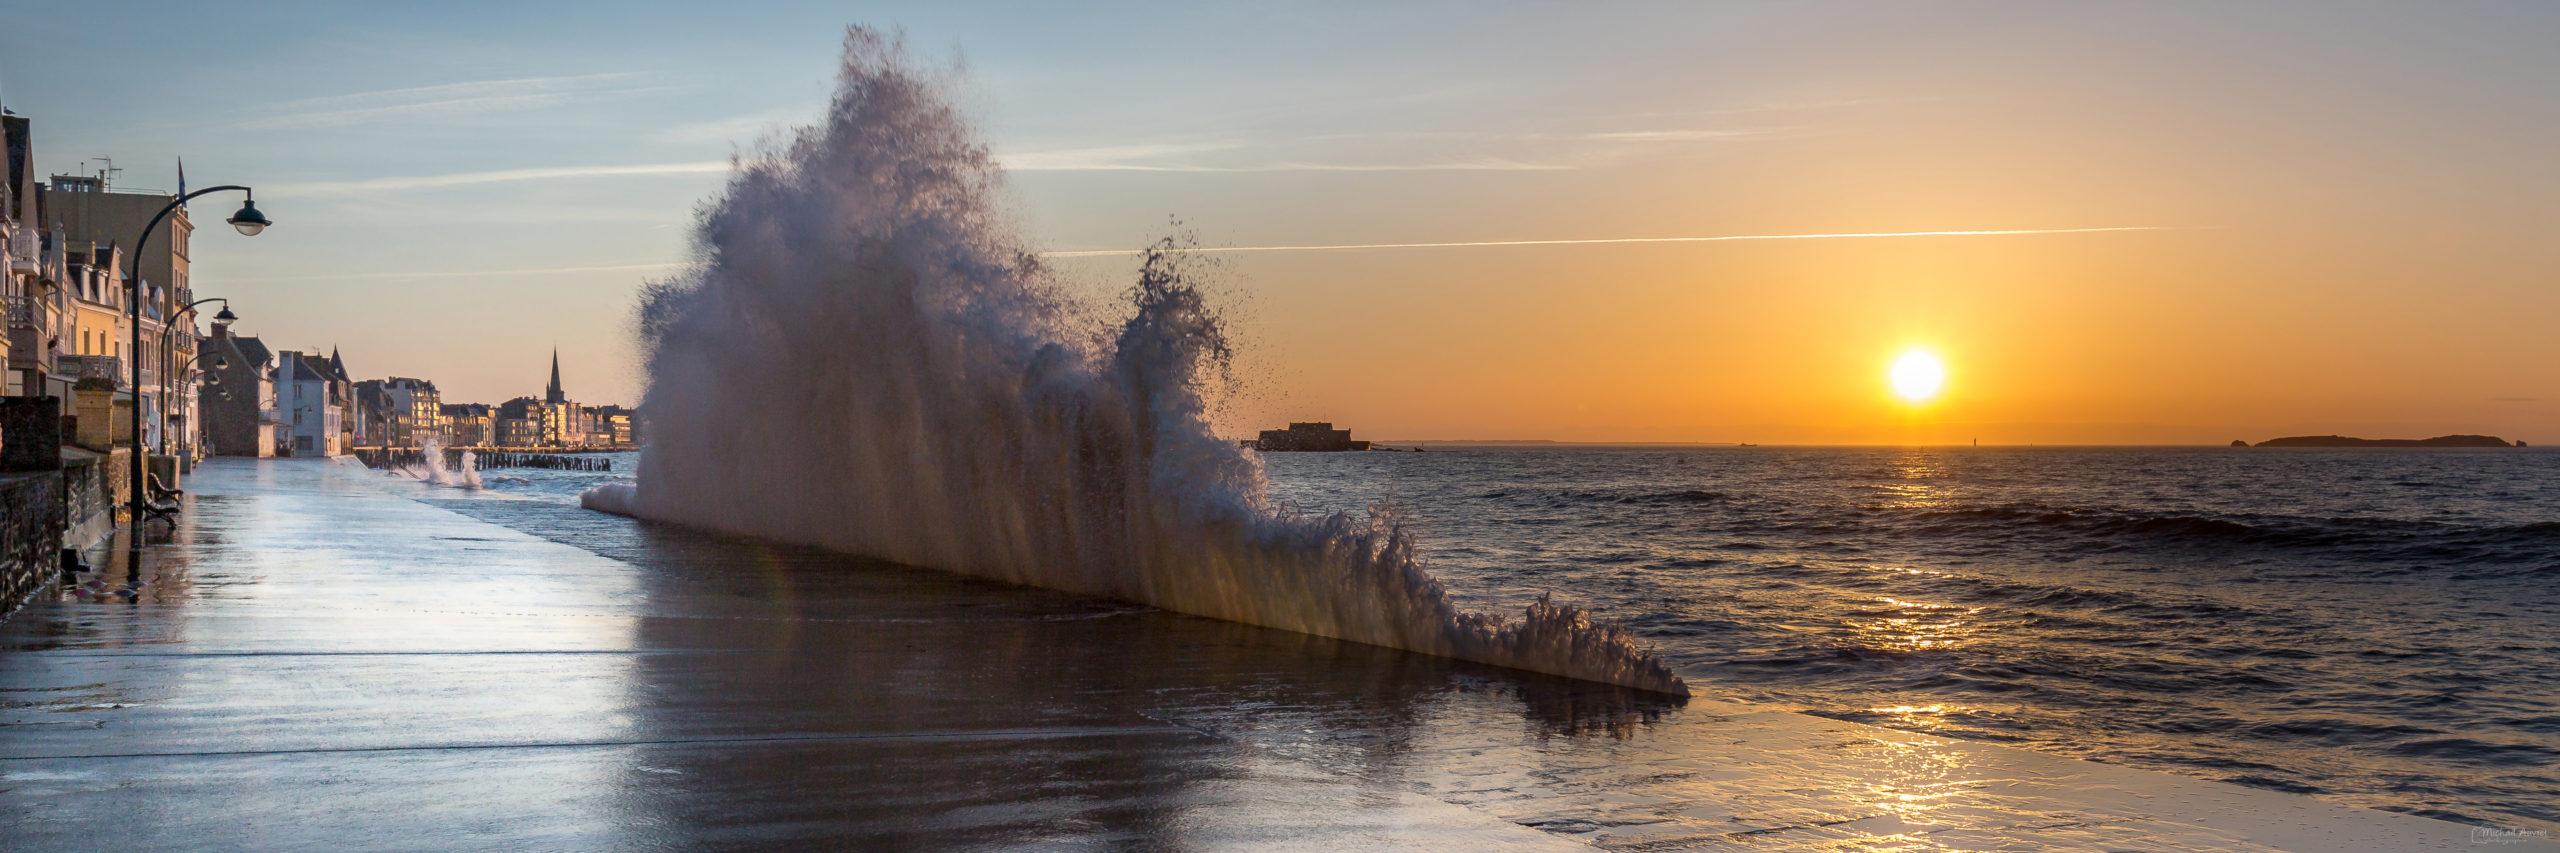 panoramique grande marée